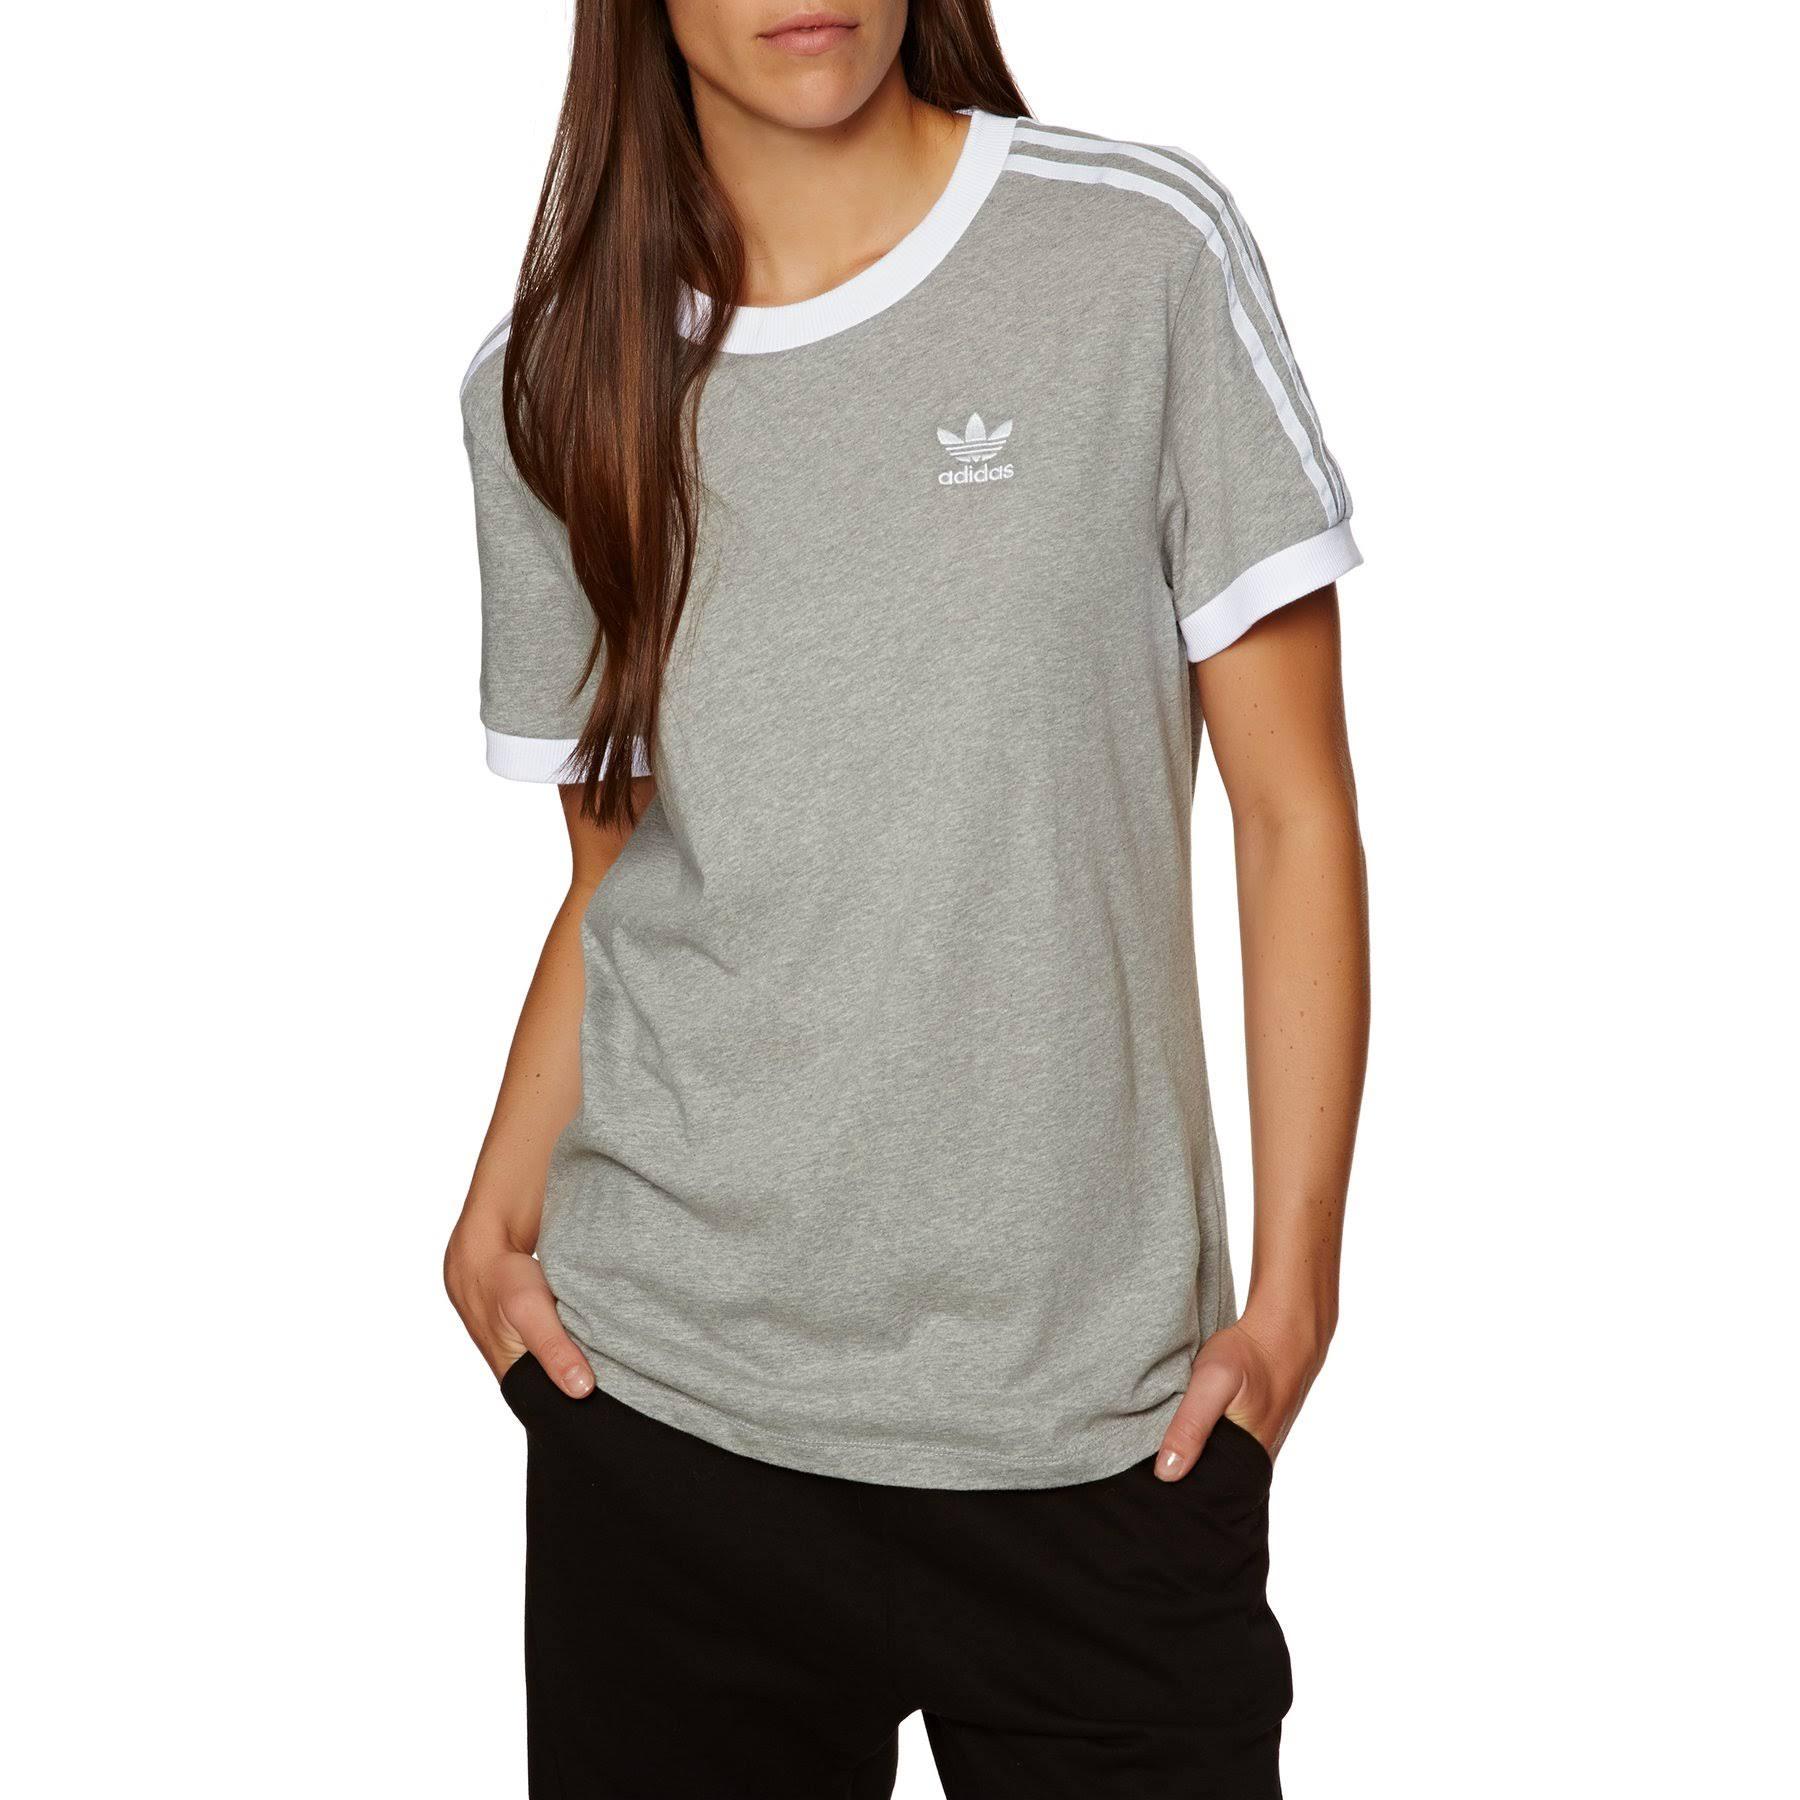 Originals Adidas 3 Stripes Gris 42 xB0g0T6zqw